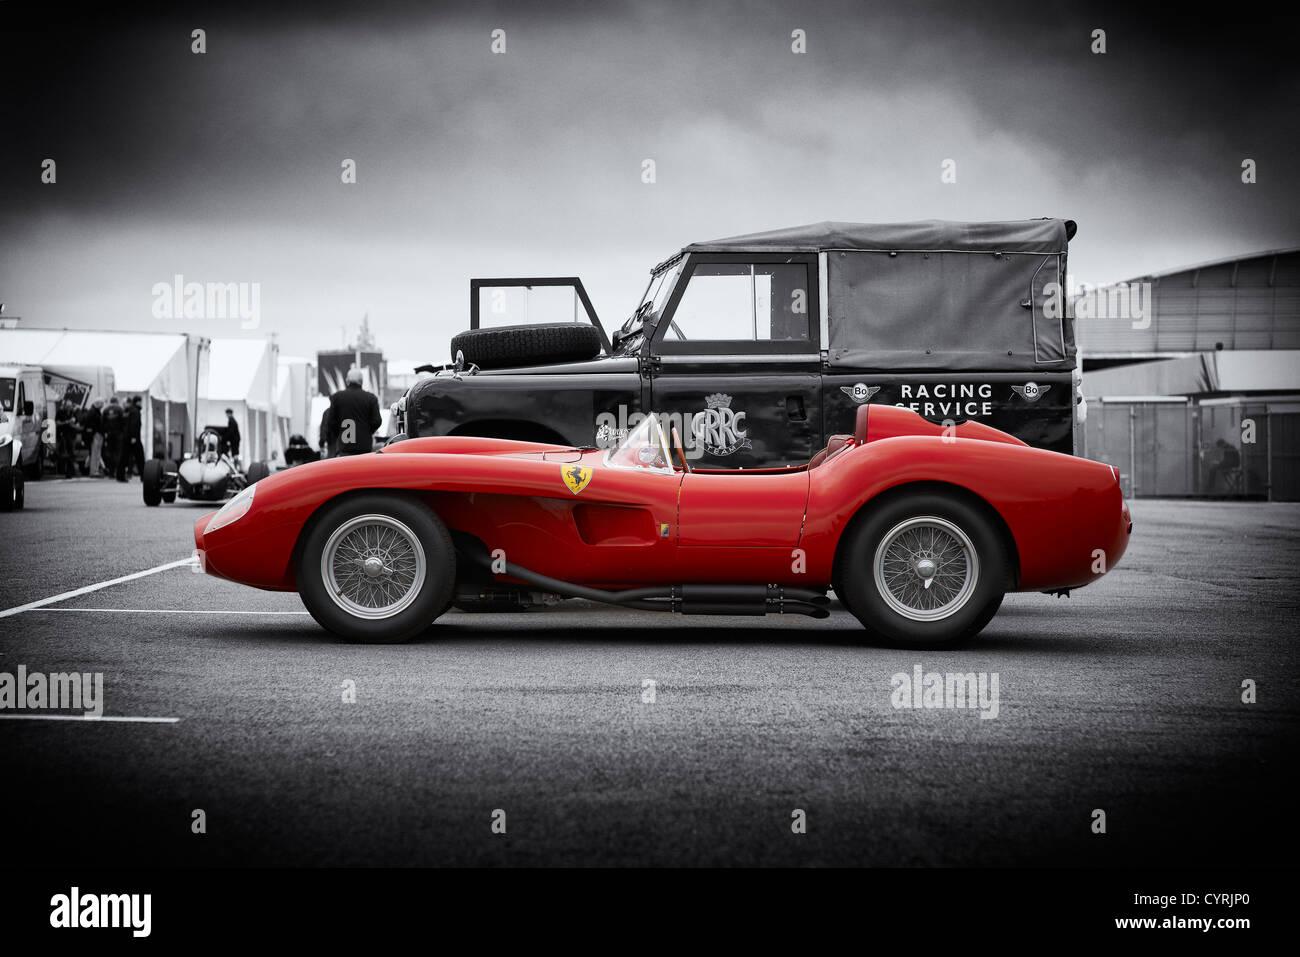 Ferrari, 250TR, 250, TR, Testa, Rossa, car, auto, classic Testarossa - Stock Image